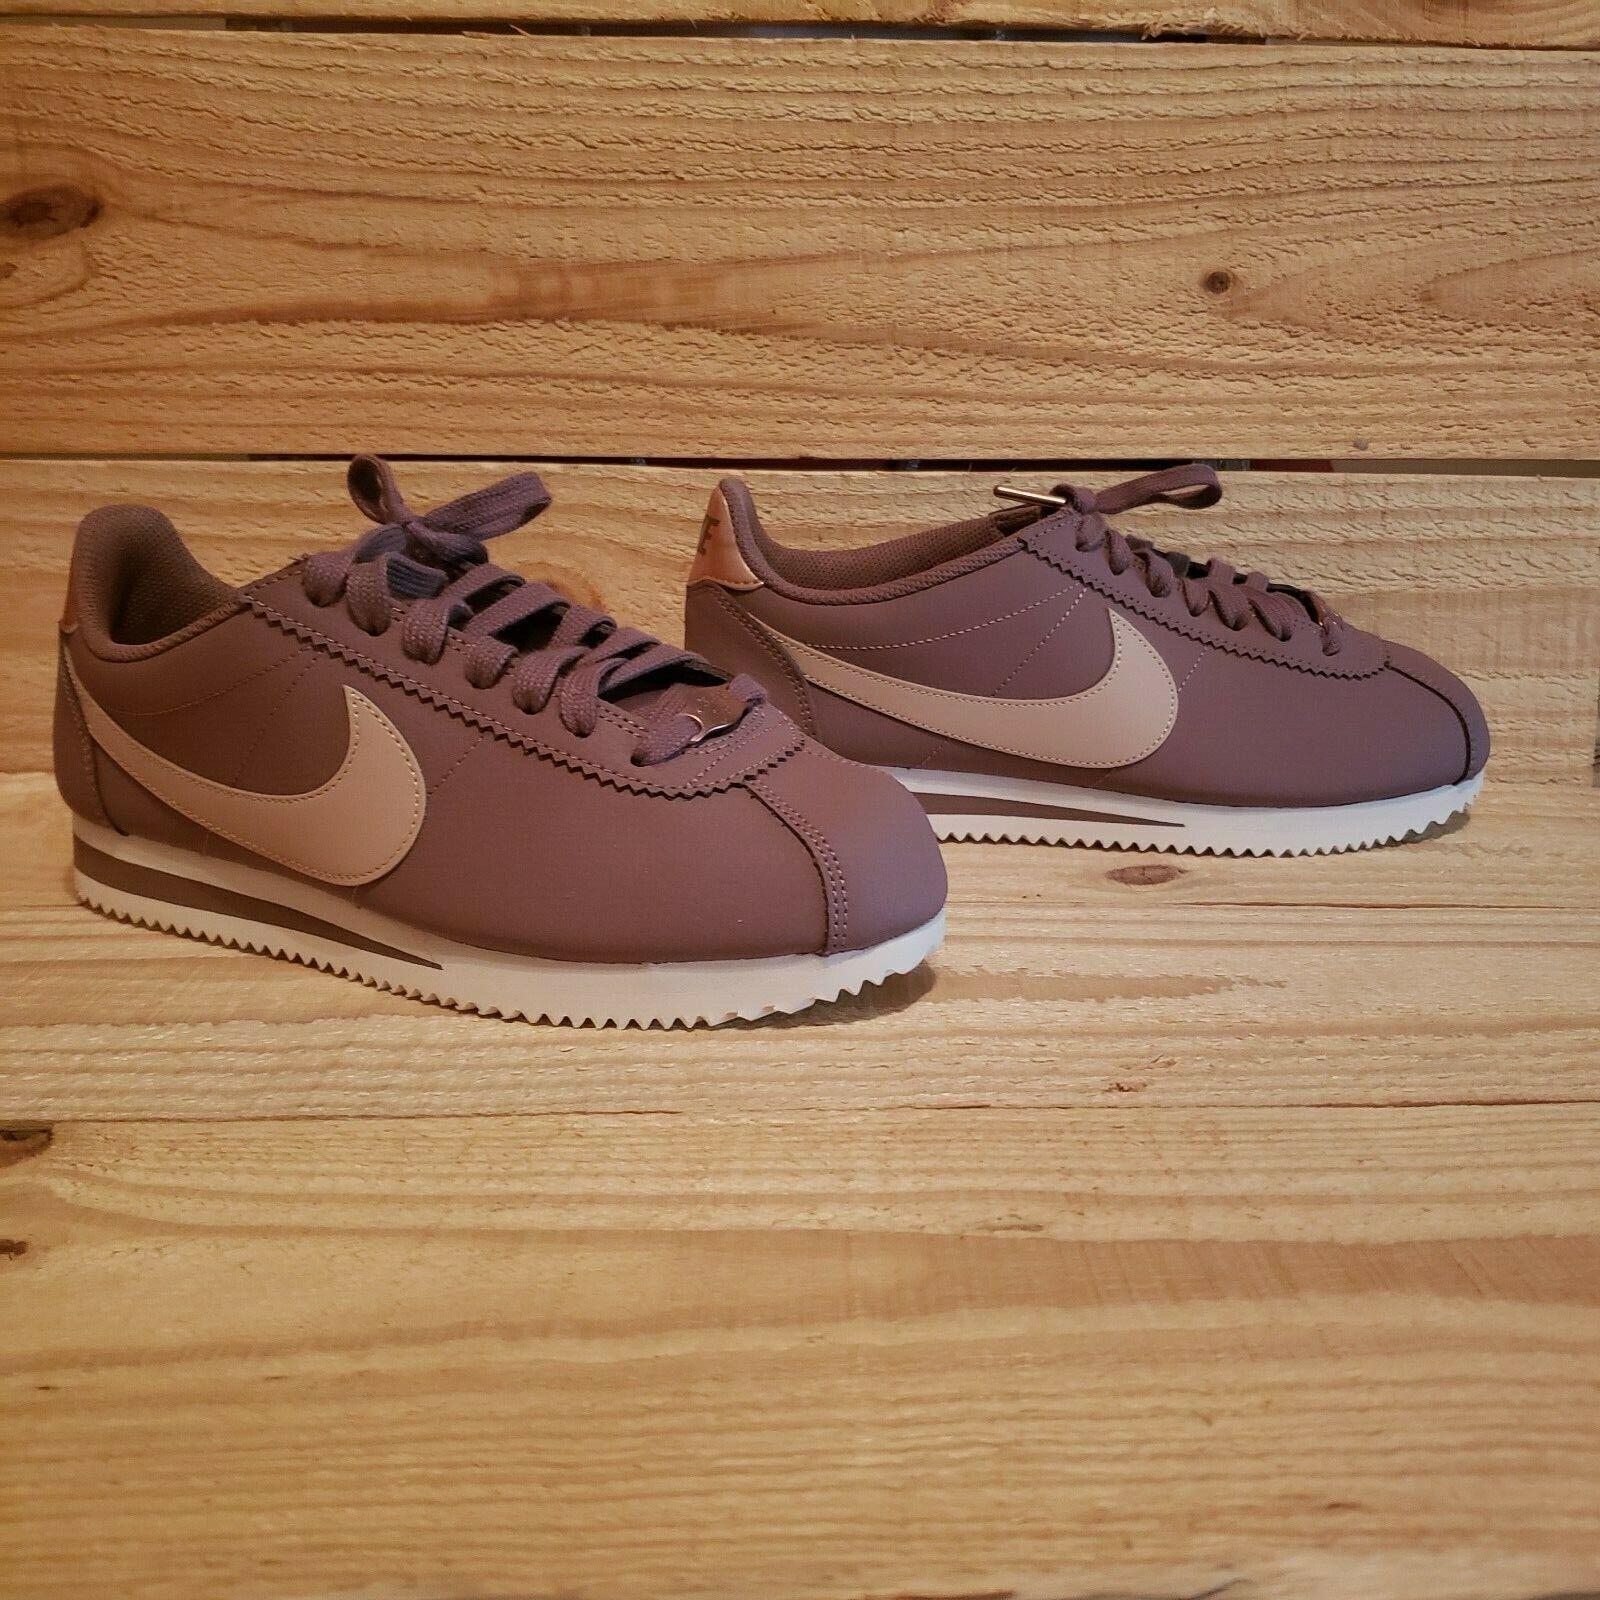 Nike Classic Cortez Leather shoes AV4618 200 200 200 Women Smokey Mauve 1810 Size Beige 456f41